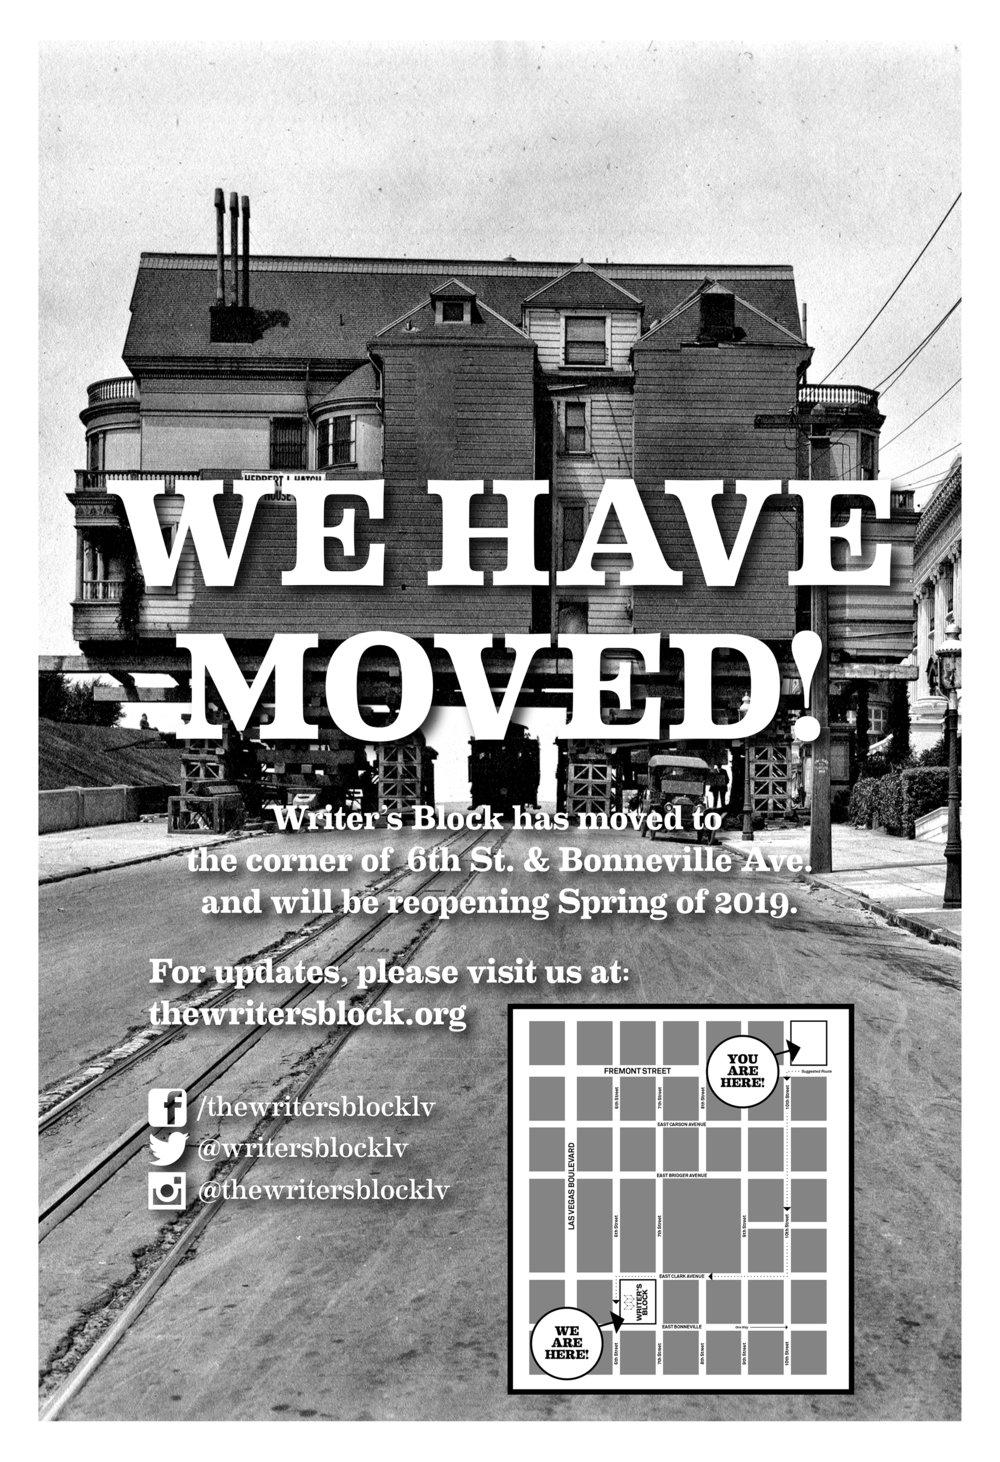 Moving_Poster-2.jpg